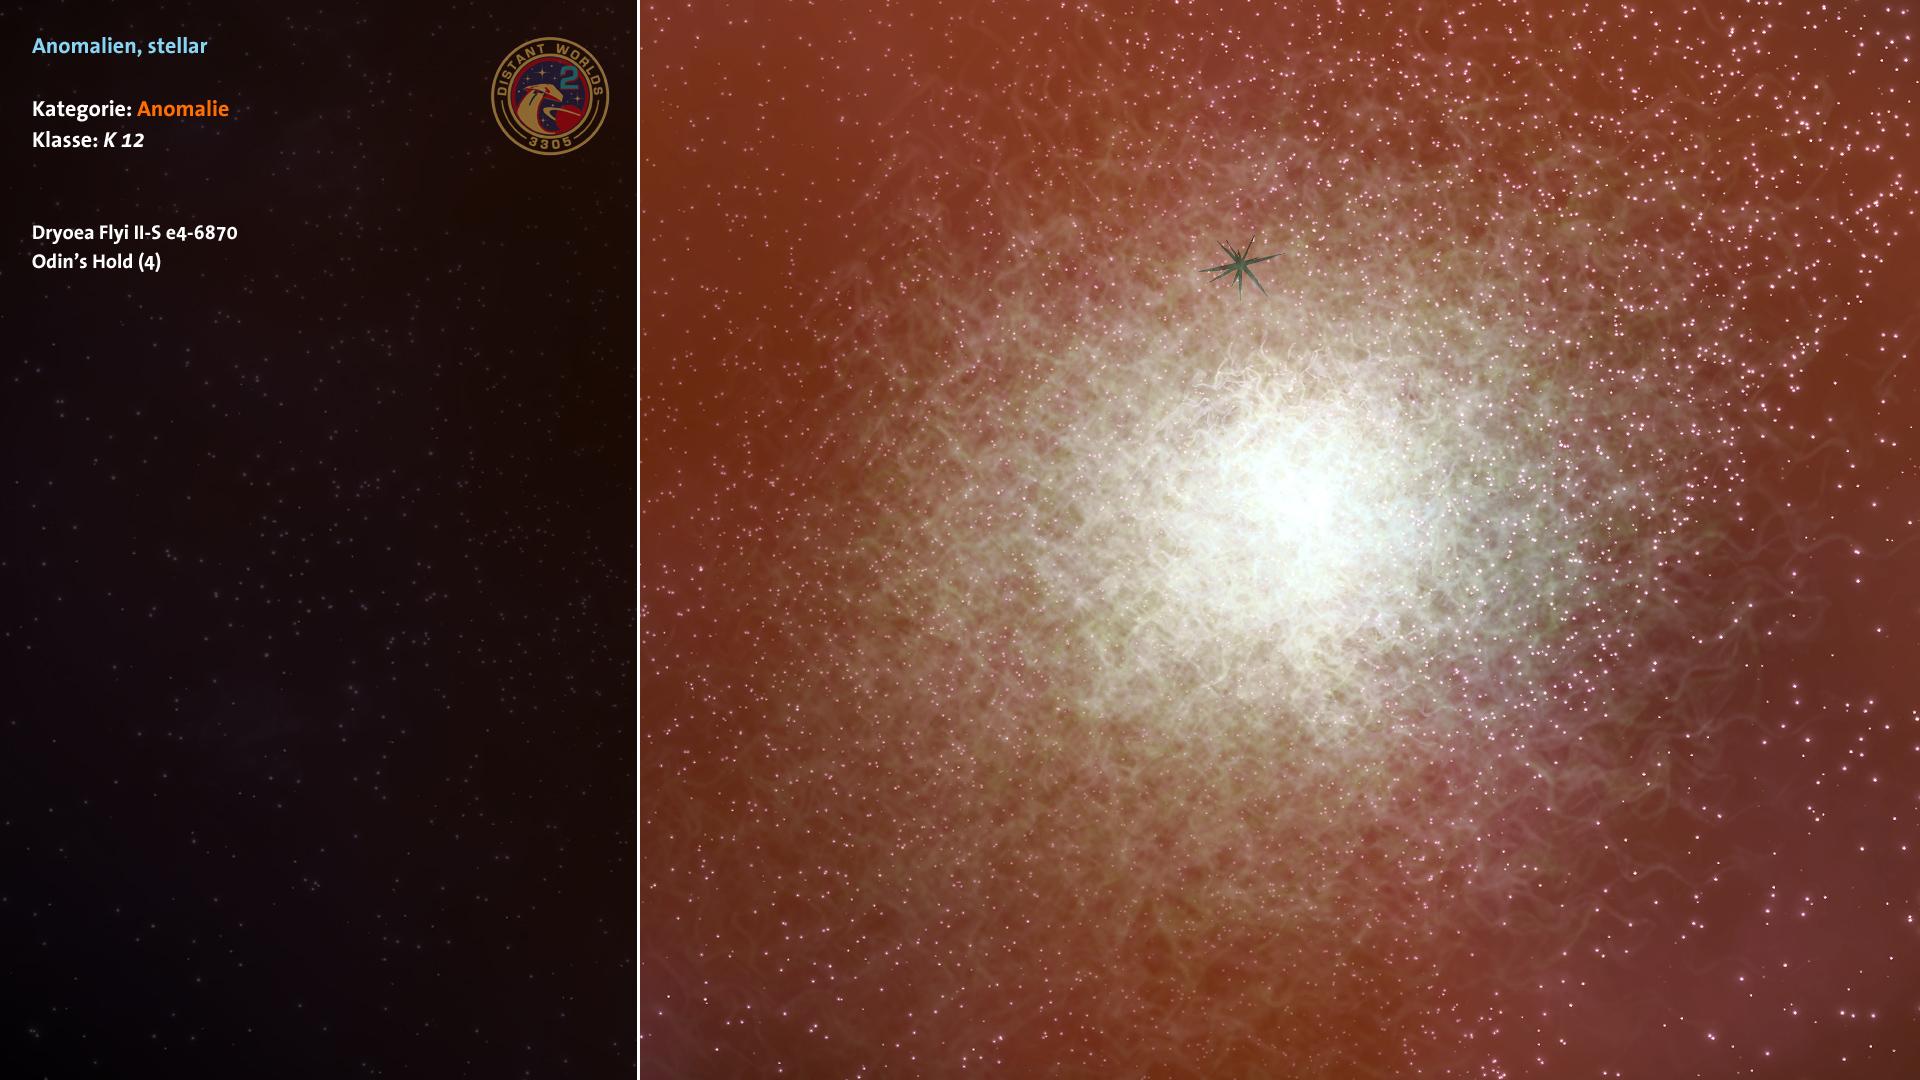 dw2-05-021-biostellarv1jra.jpg